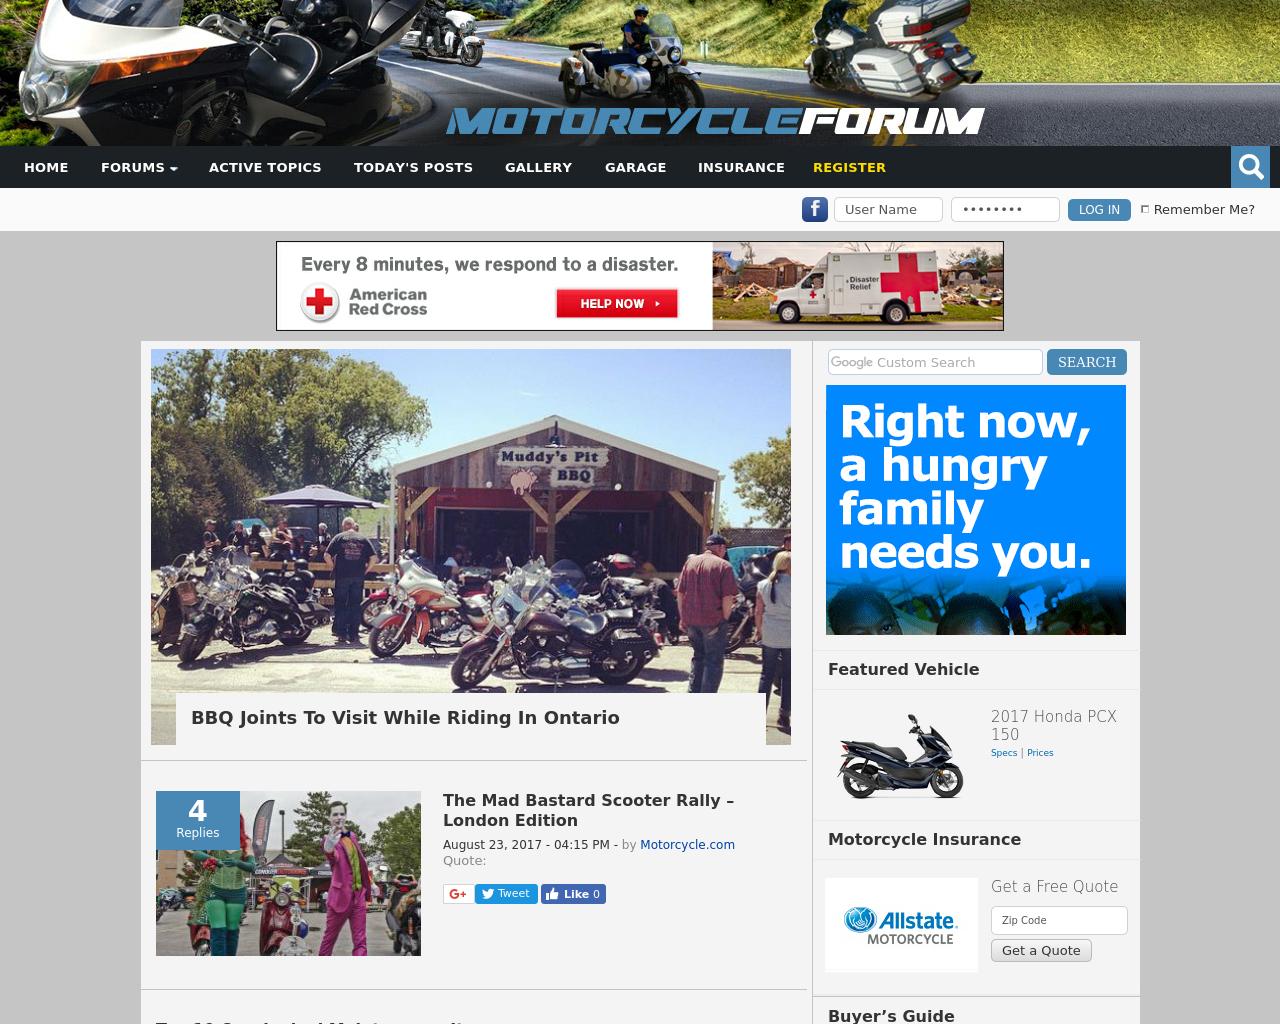 Motorcycle-Forum-Advertising-Reviews-Pricing